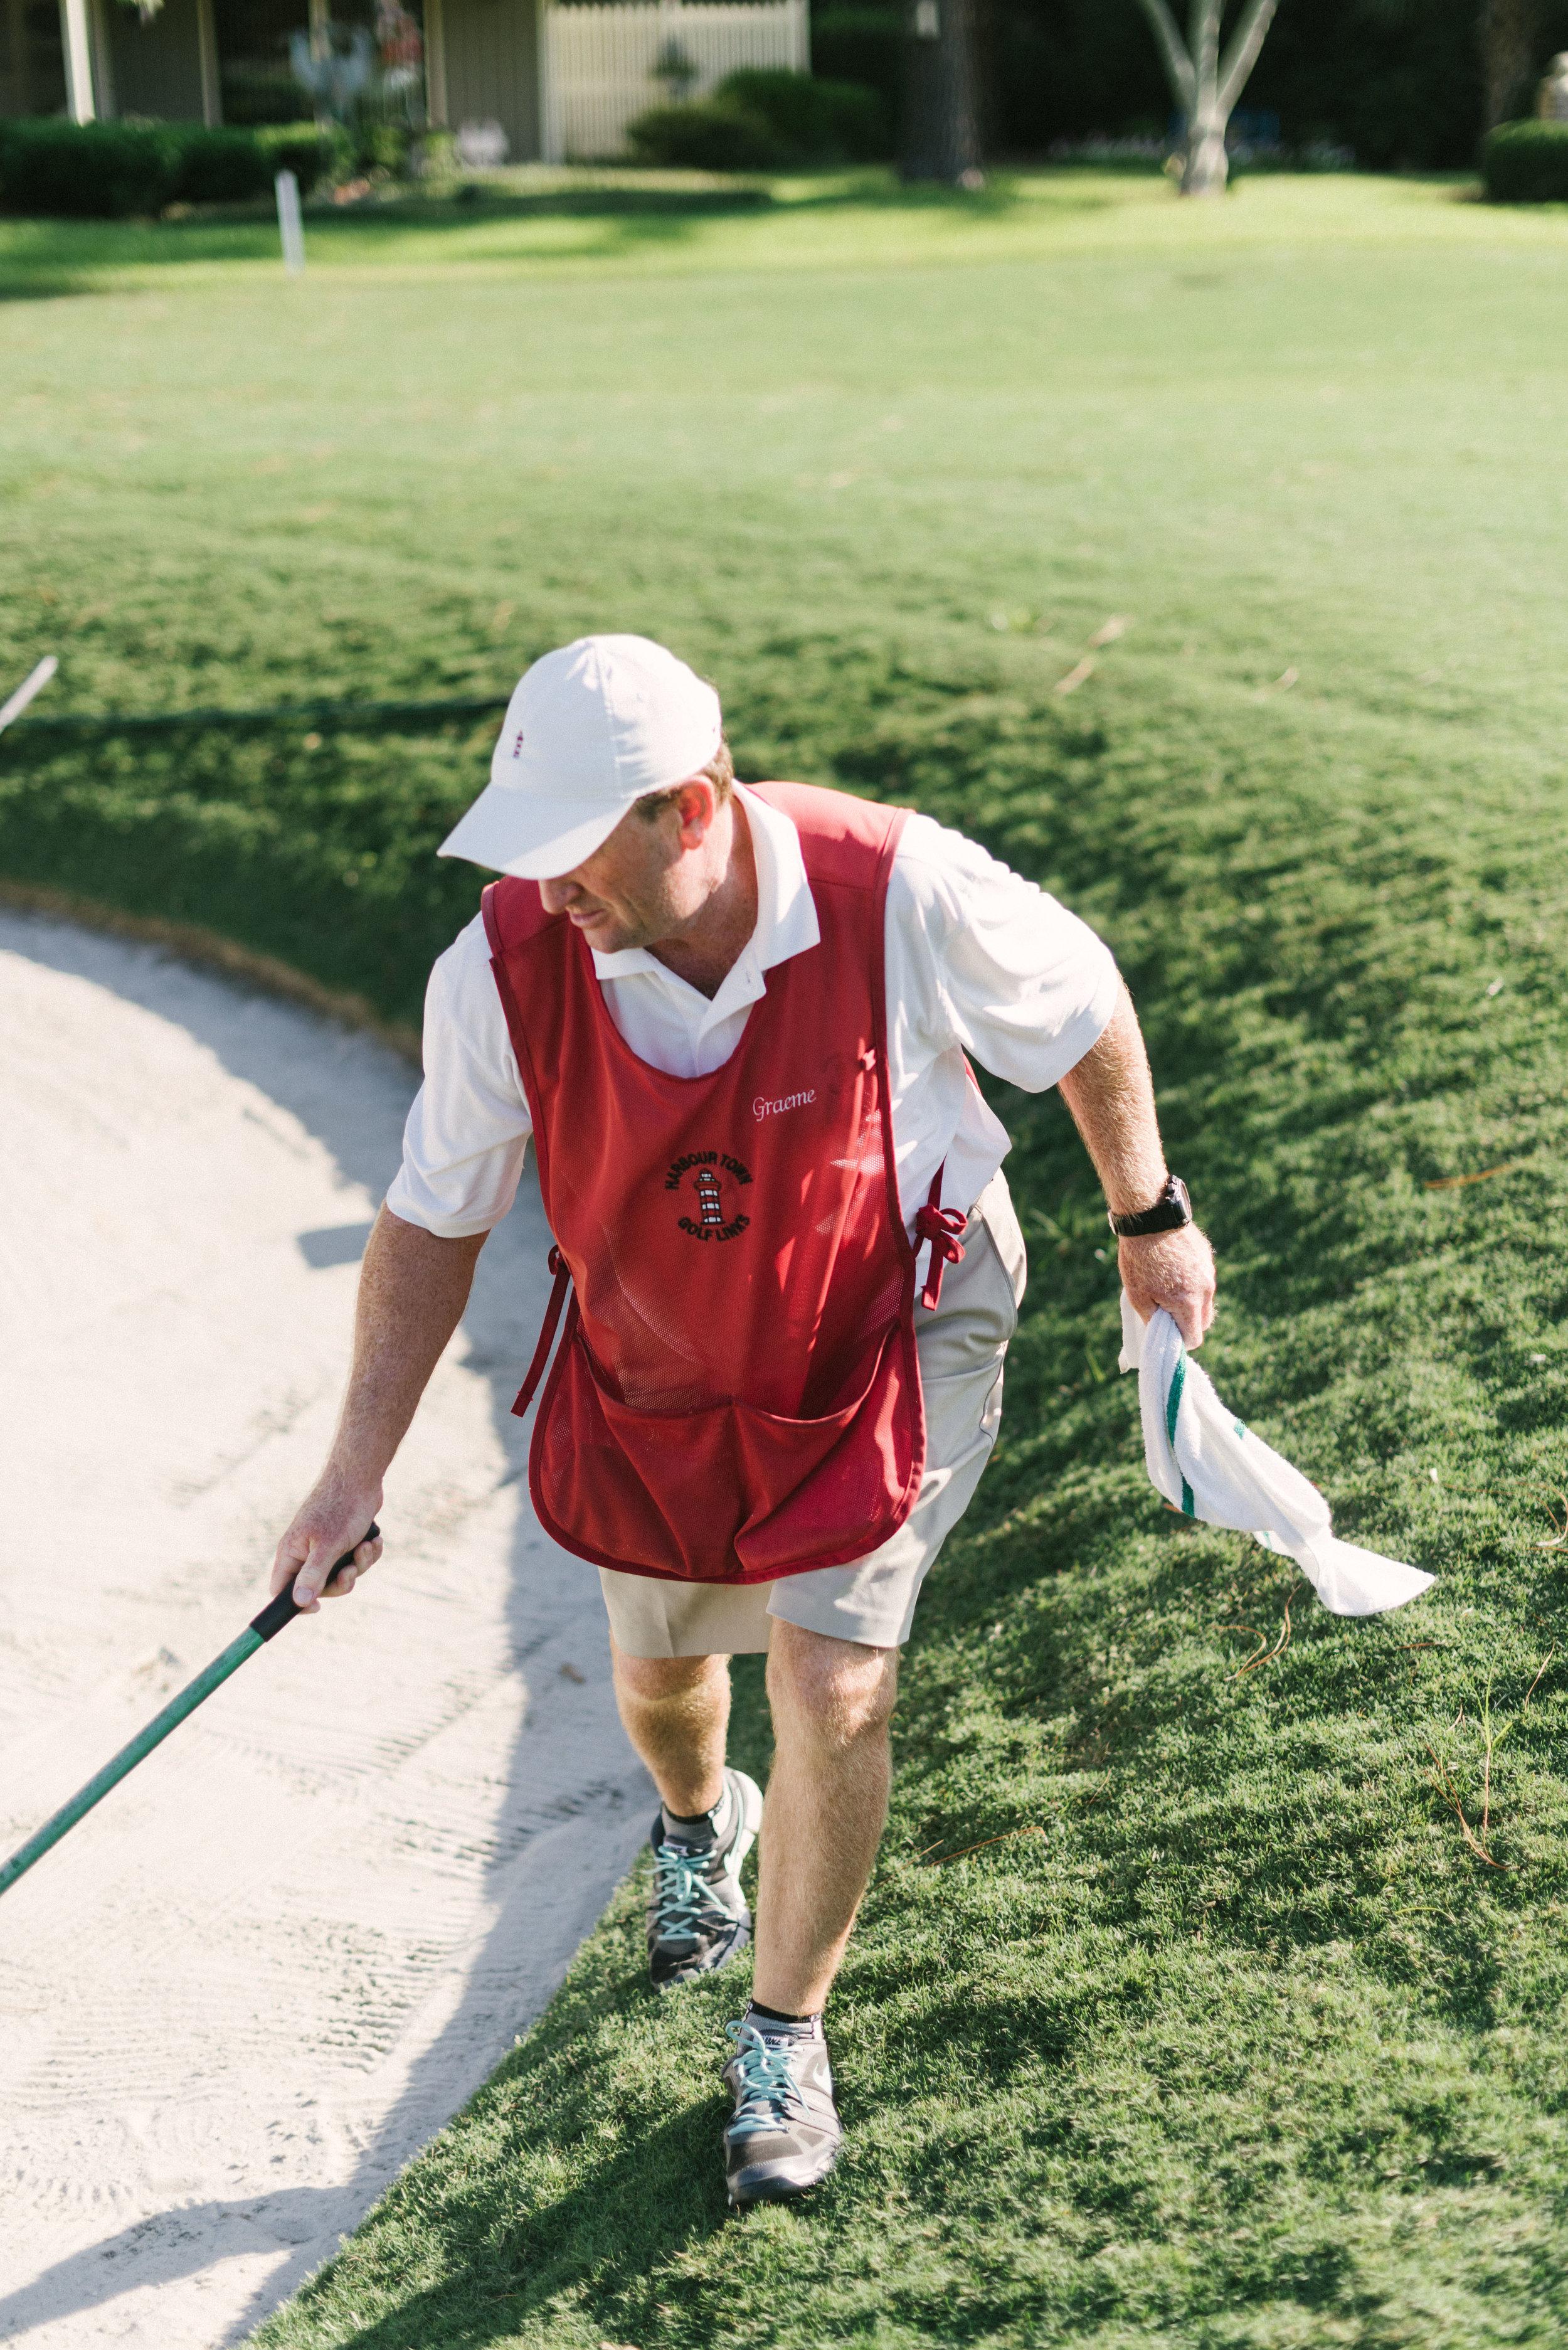 Whymer_Golf_Online-95.jpg